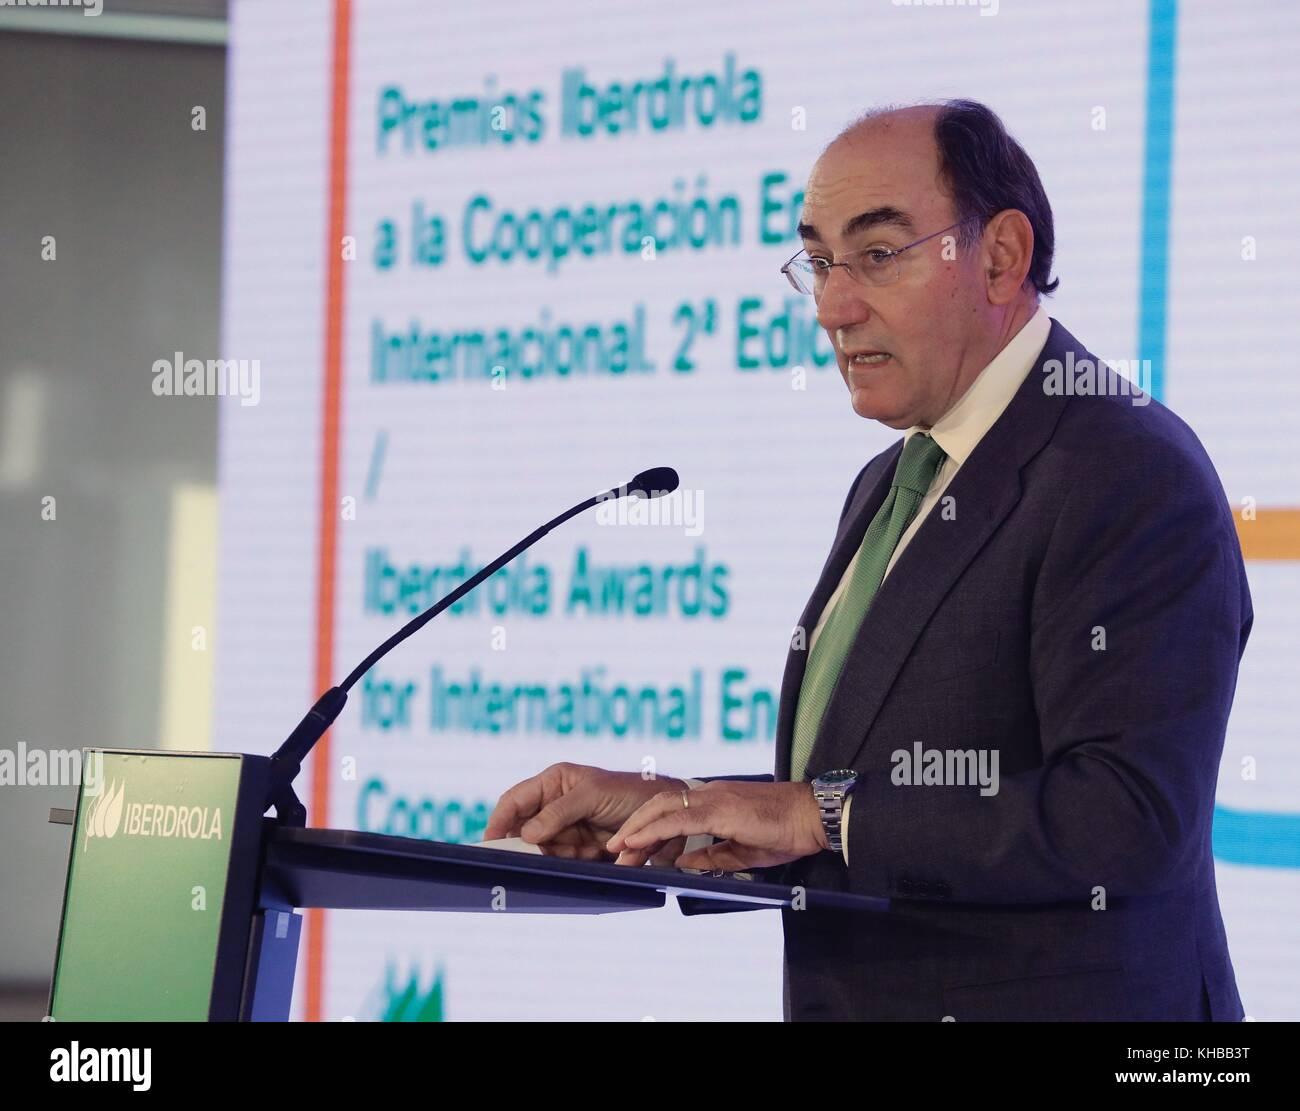 Madrid, Spain. 15th Nov, 2017. Chairman of Spanish multinational Iberdrola, Ignacio Sanchez Galan, speaks during - Stock Image